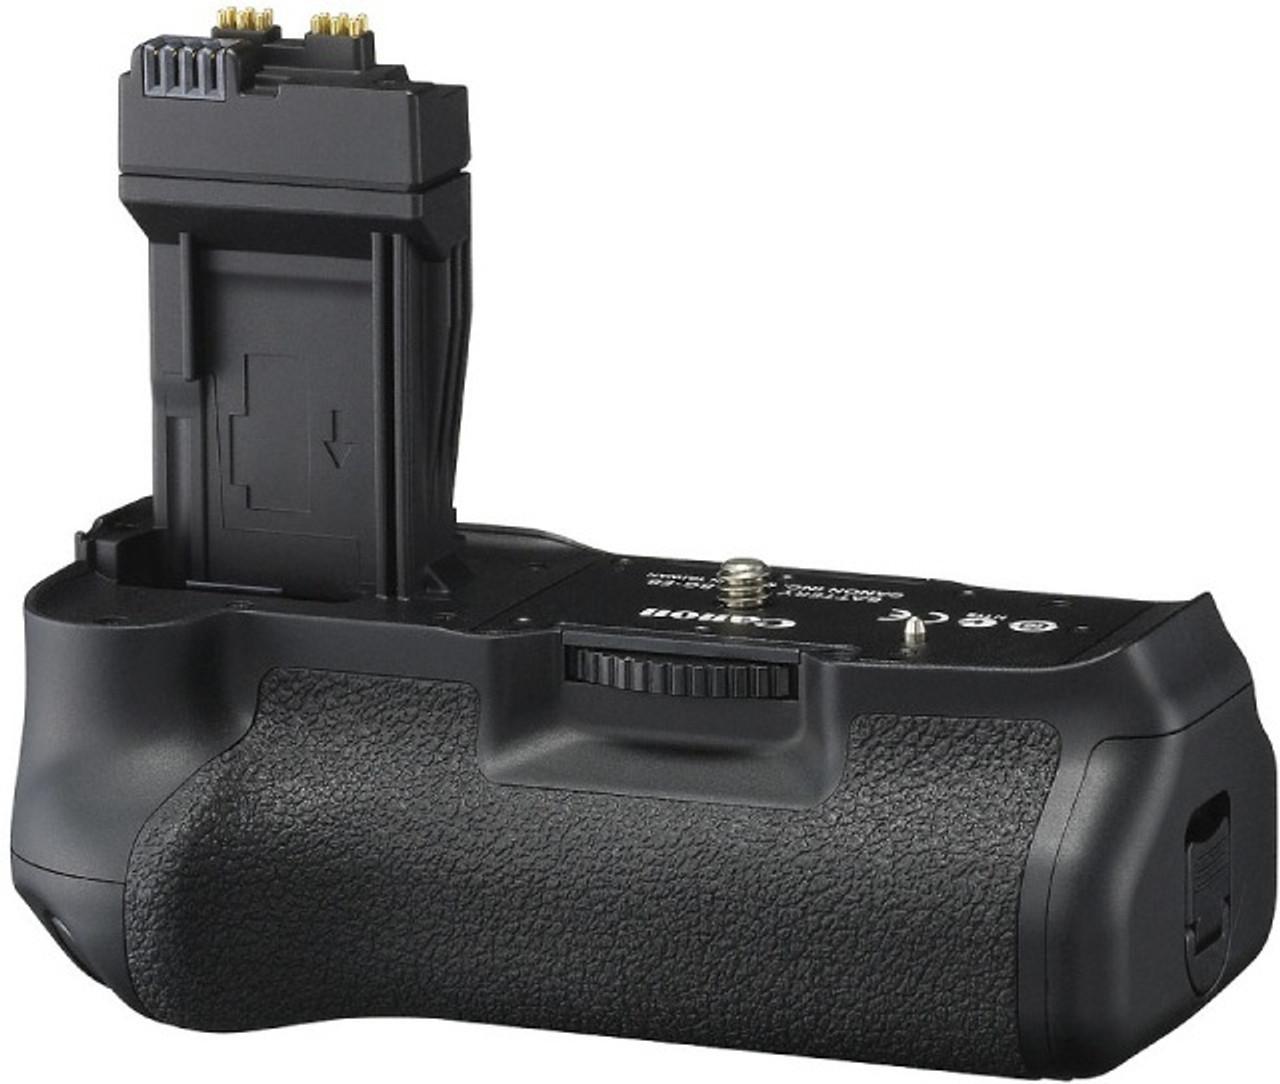 Canon BG-E8 Battery Grip for Canon EOS Rebel T2i